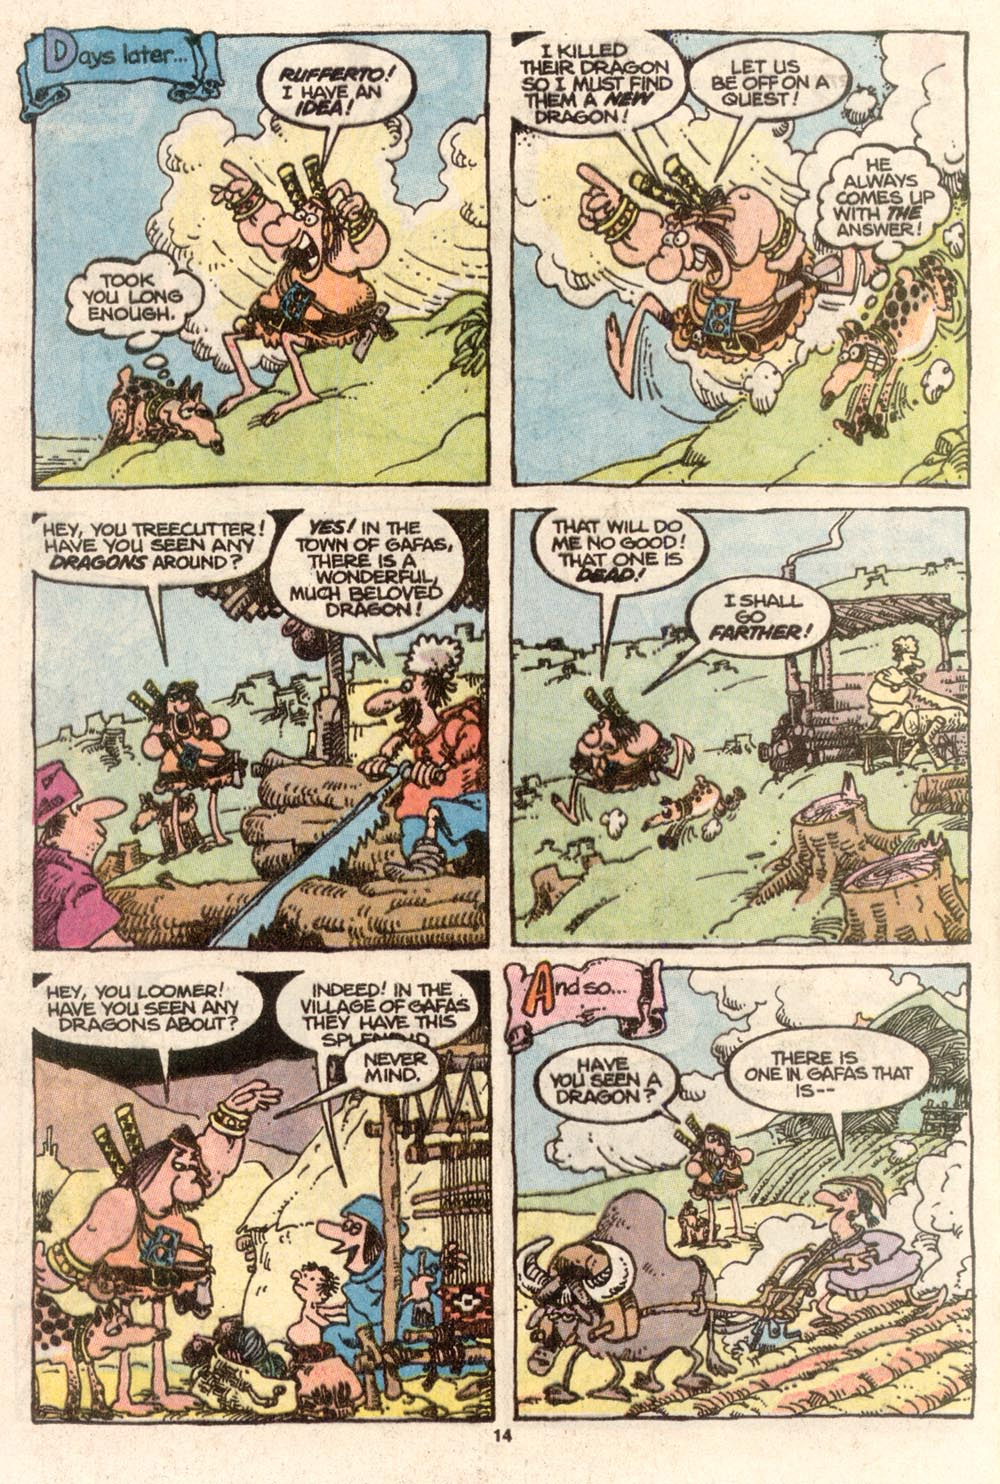 Read online Sergio Aragonés Groo the Wanderer comic -  Issue #67 - 10